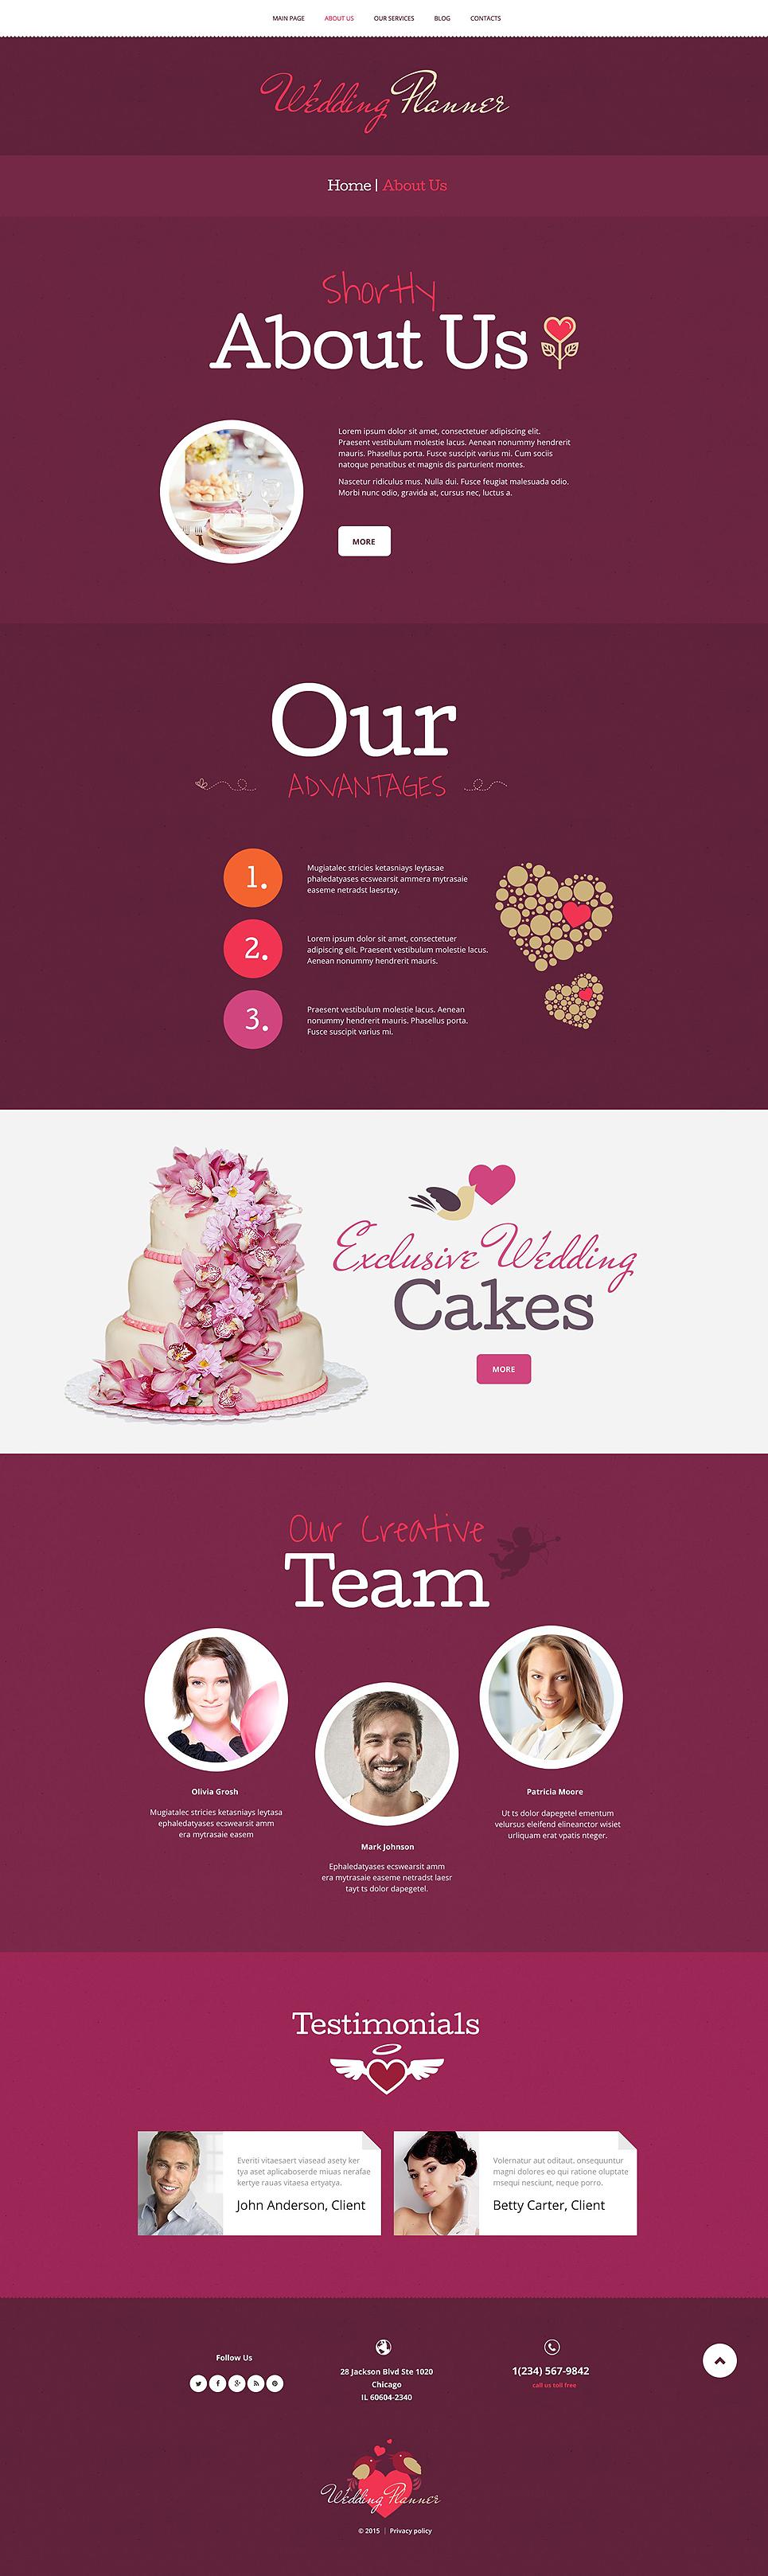 Wedding Planner WordPress Theme WordPress Theme